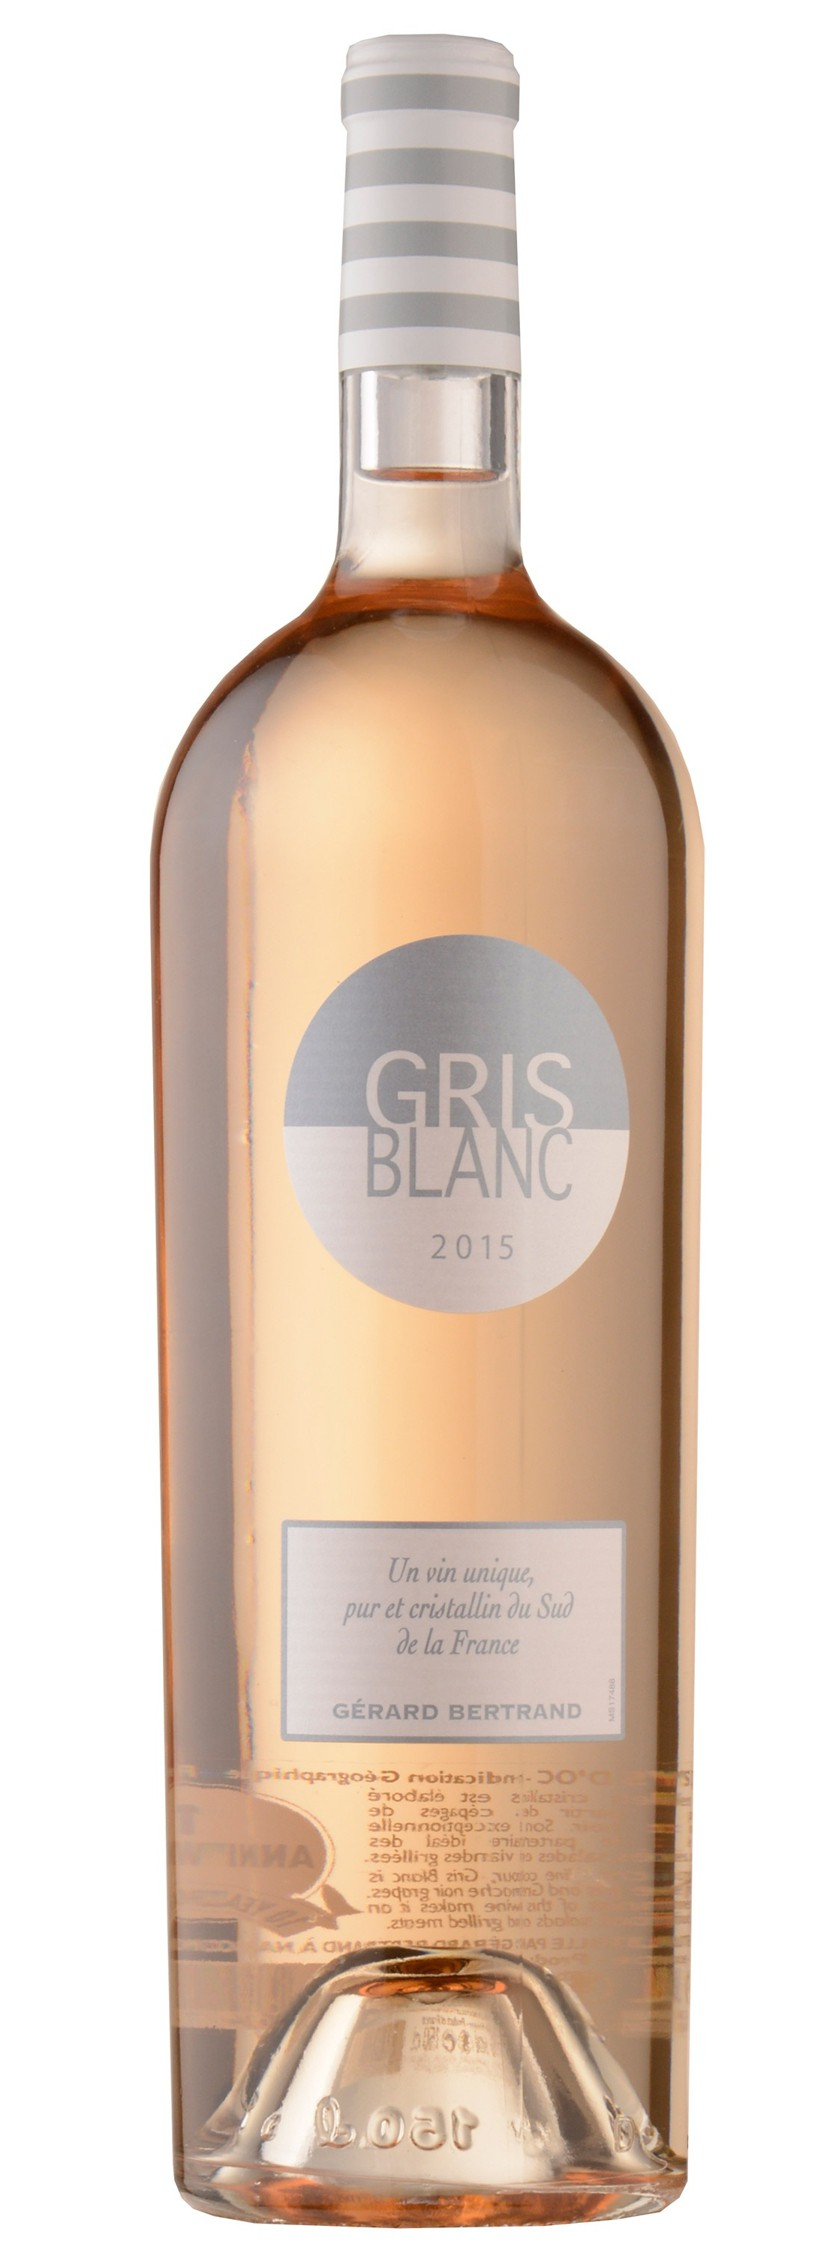 Gerard Bertrand - Gris Blanc (rosé) magnum